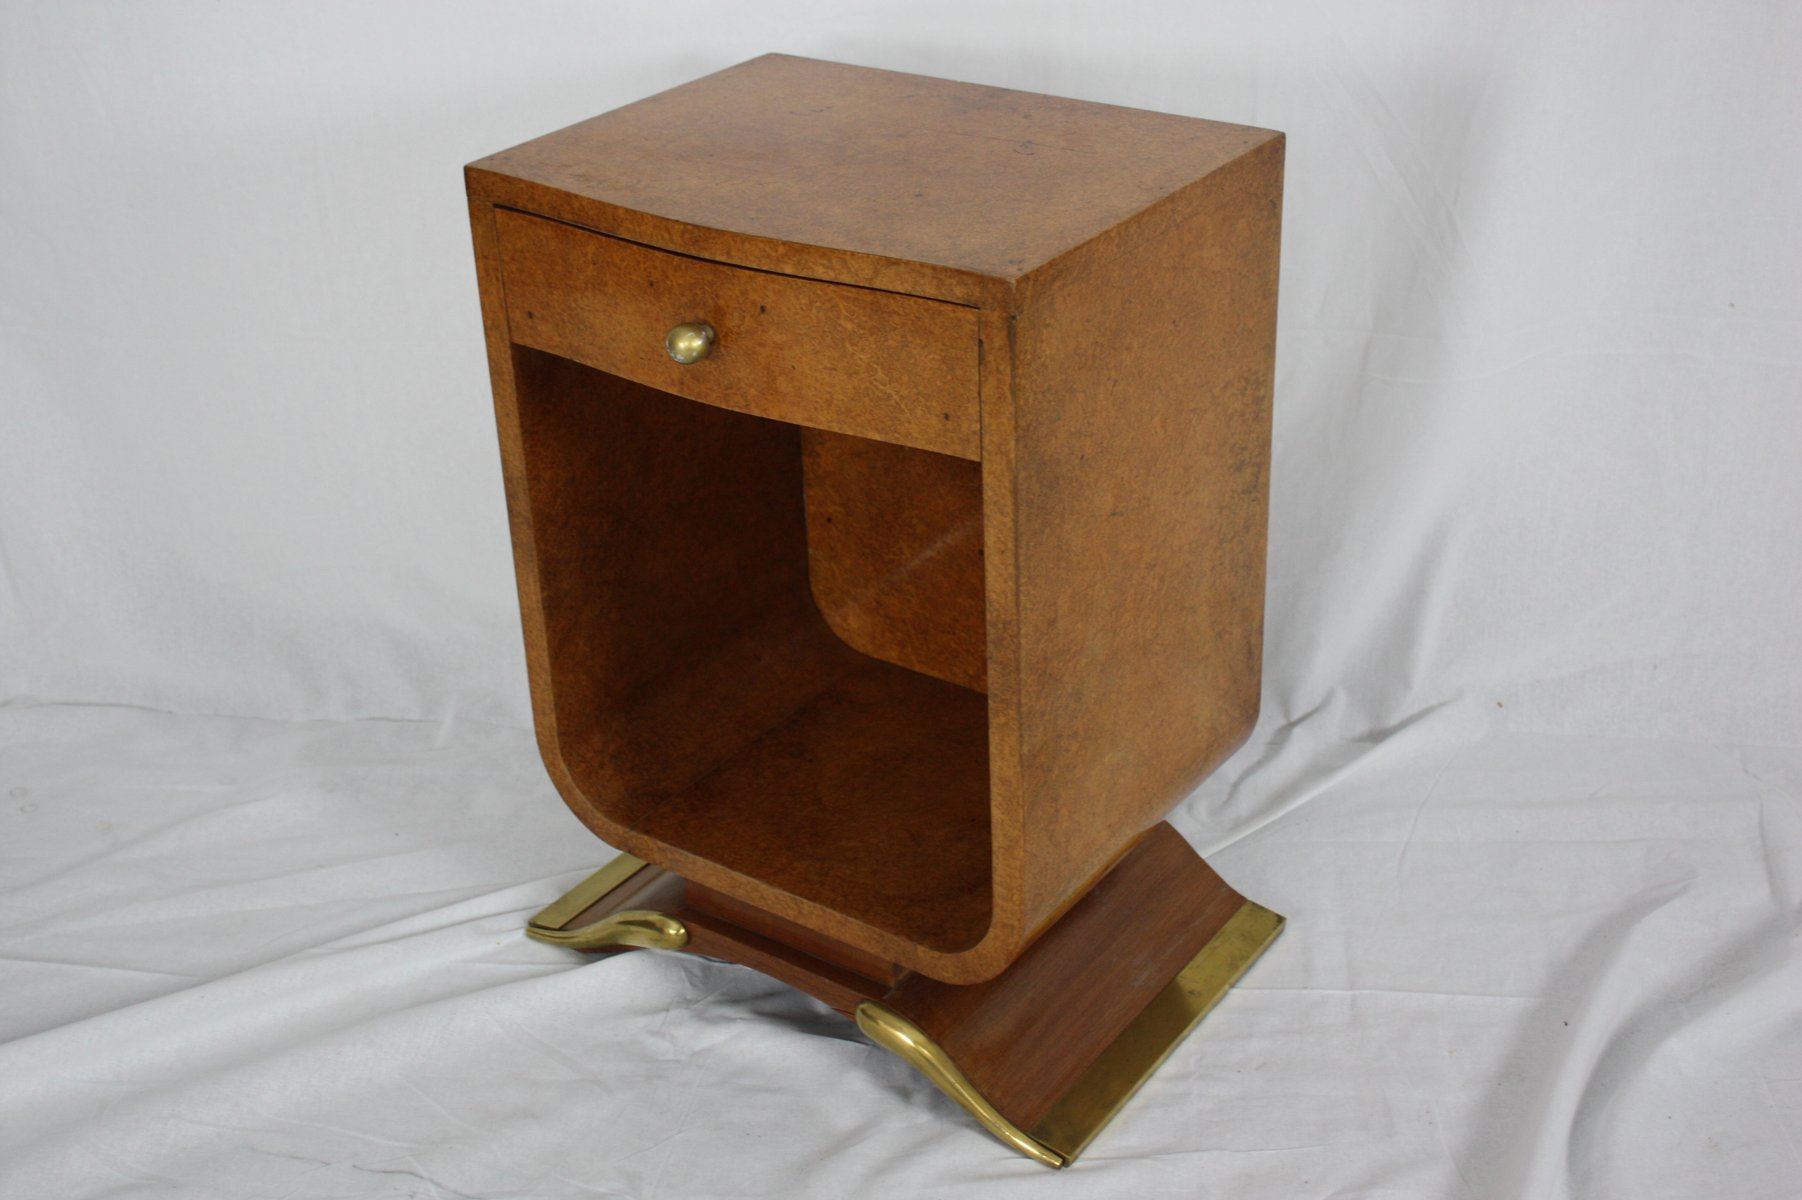 wurzelholz tisch kaufen beautiful wurzelholz tisch free die im detail with wurzelholz tisch. Black Bedroom Furniture Sets. Home Design Ideas